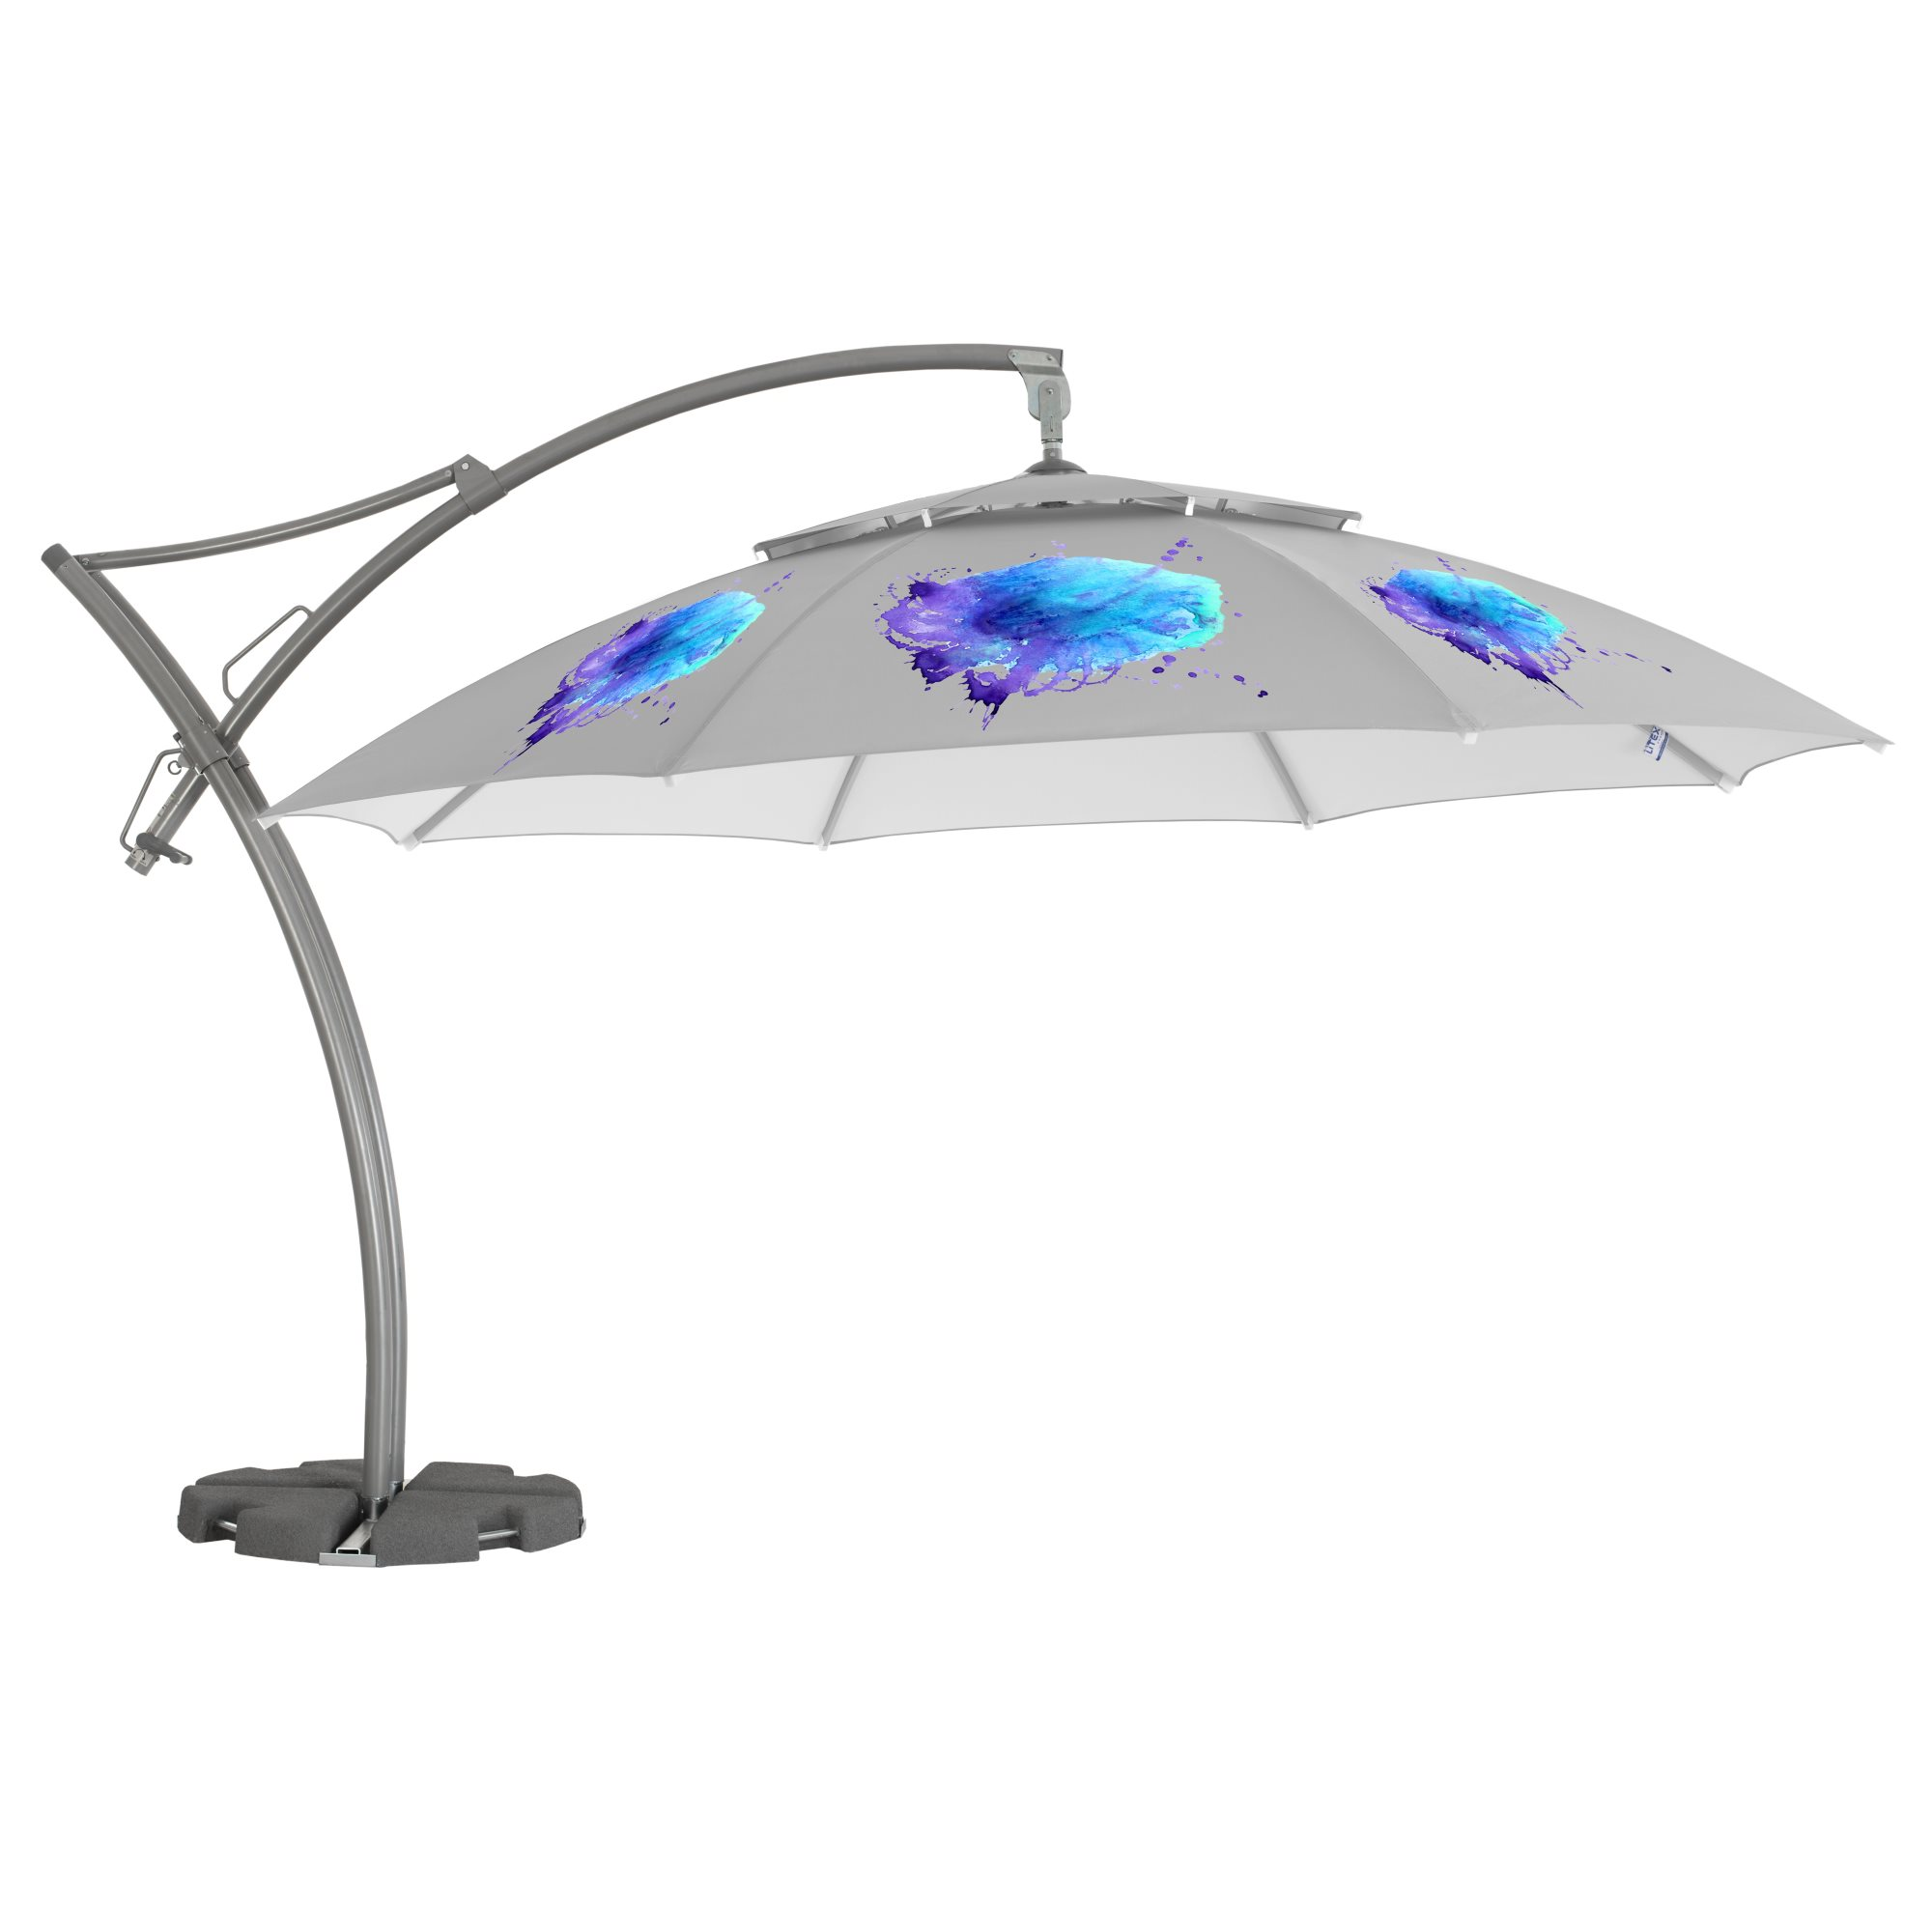 2. Ibiza Parasol Achteckig 4,2m